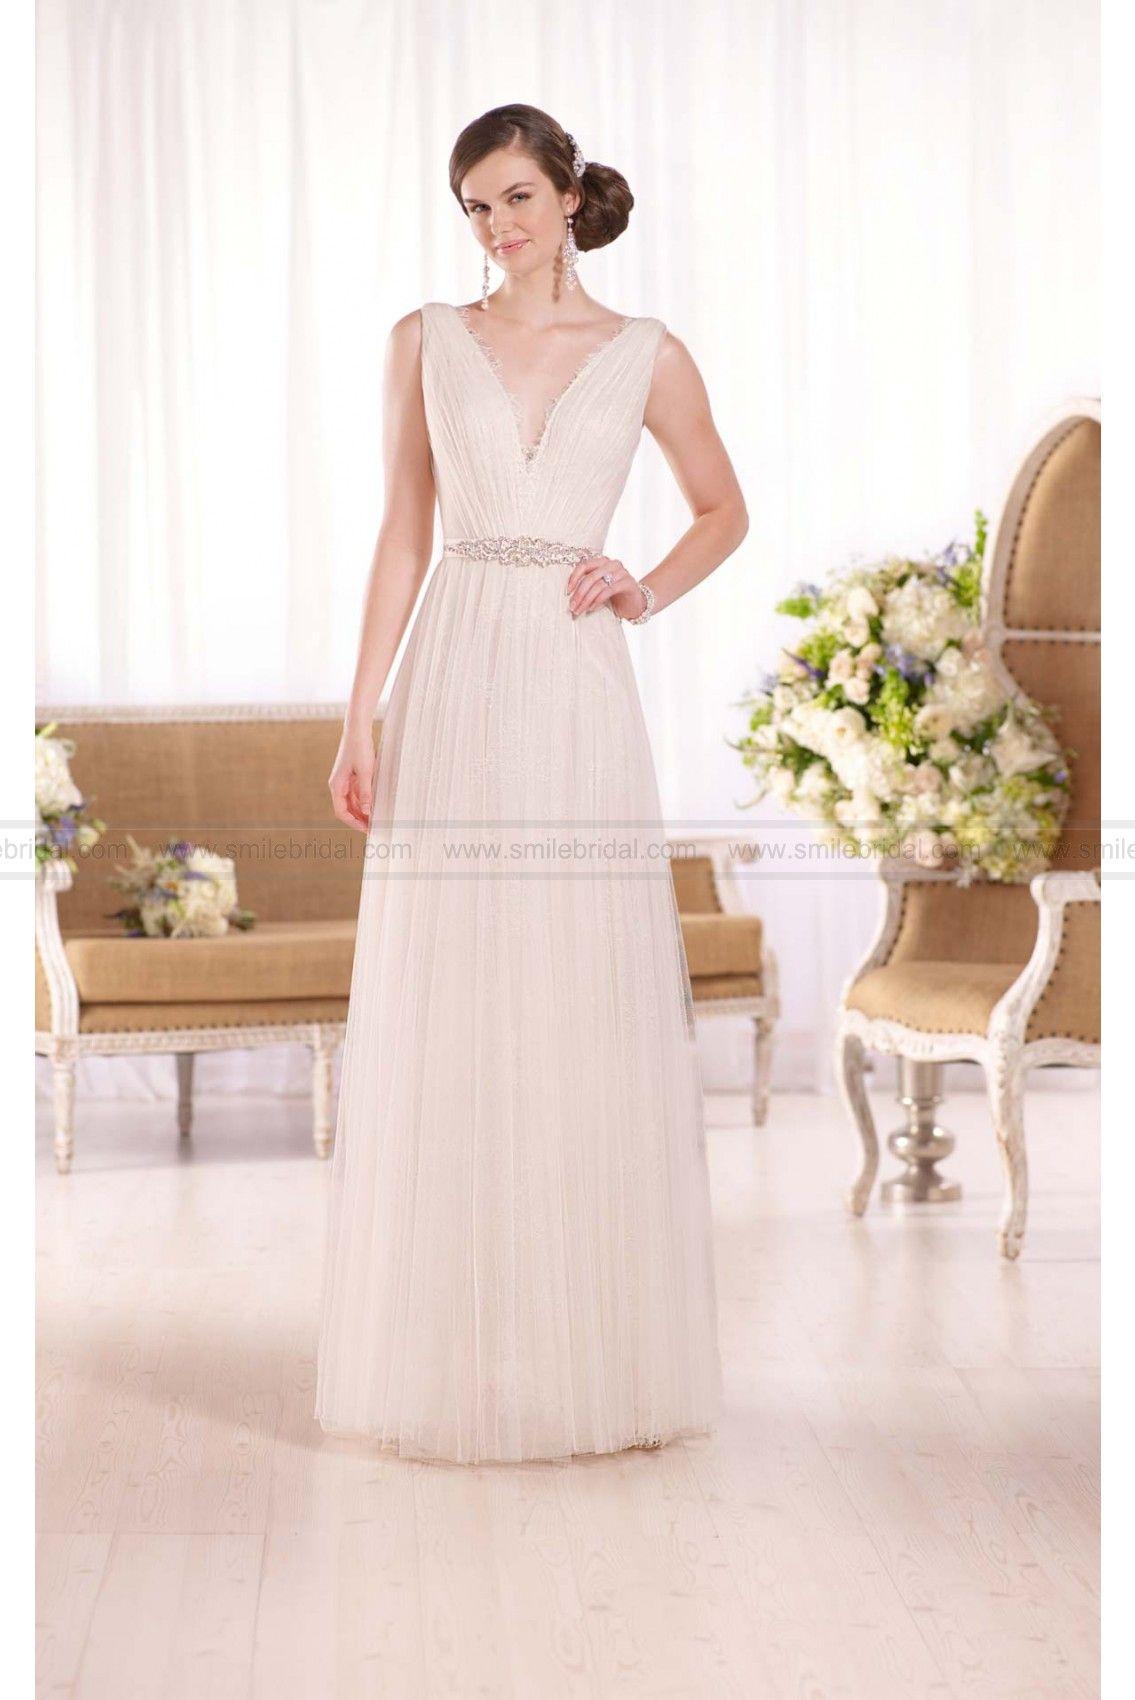 Essense of australia grecianinspired sheath wedding dress style